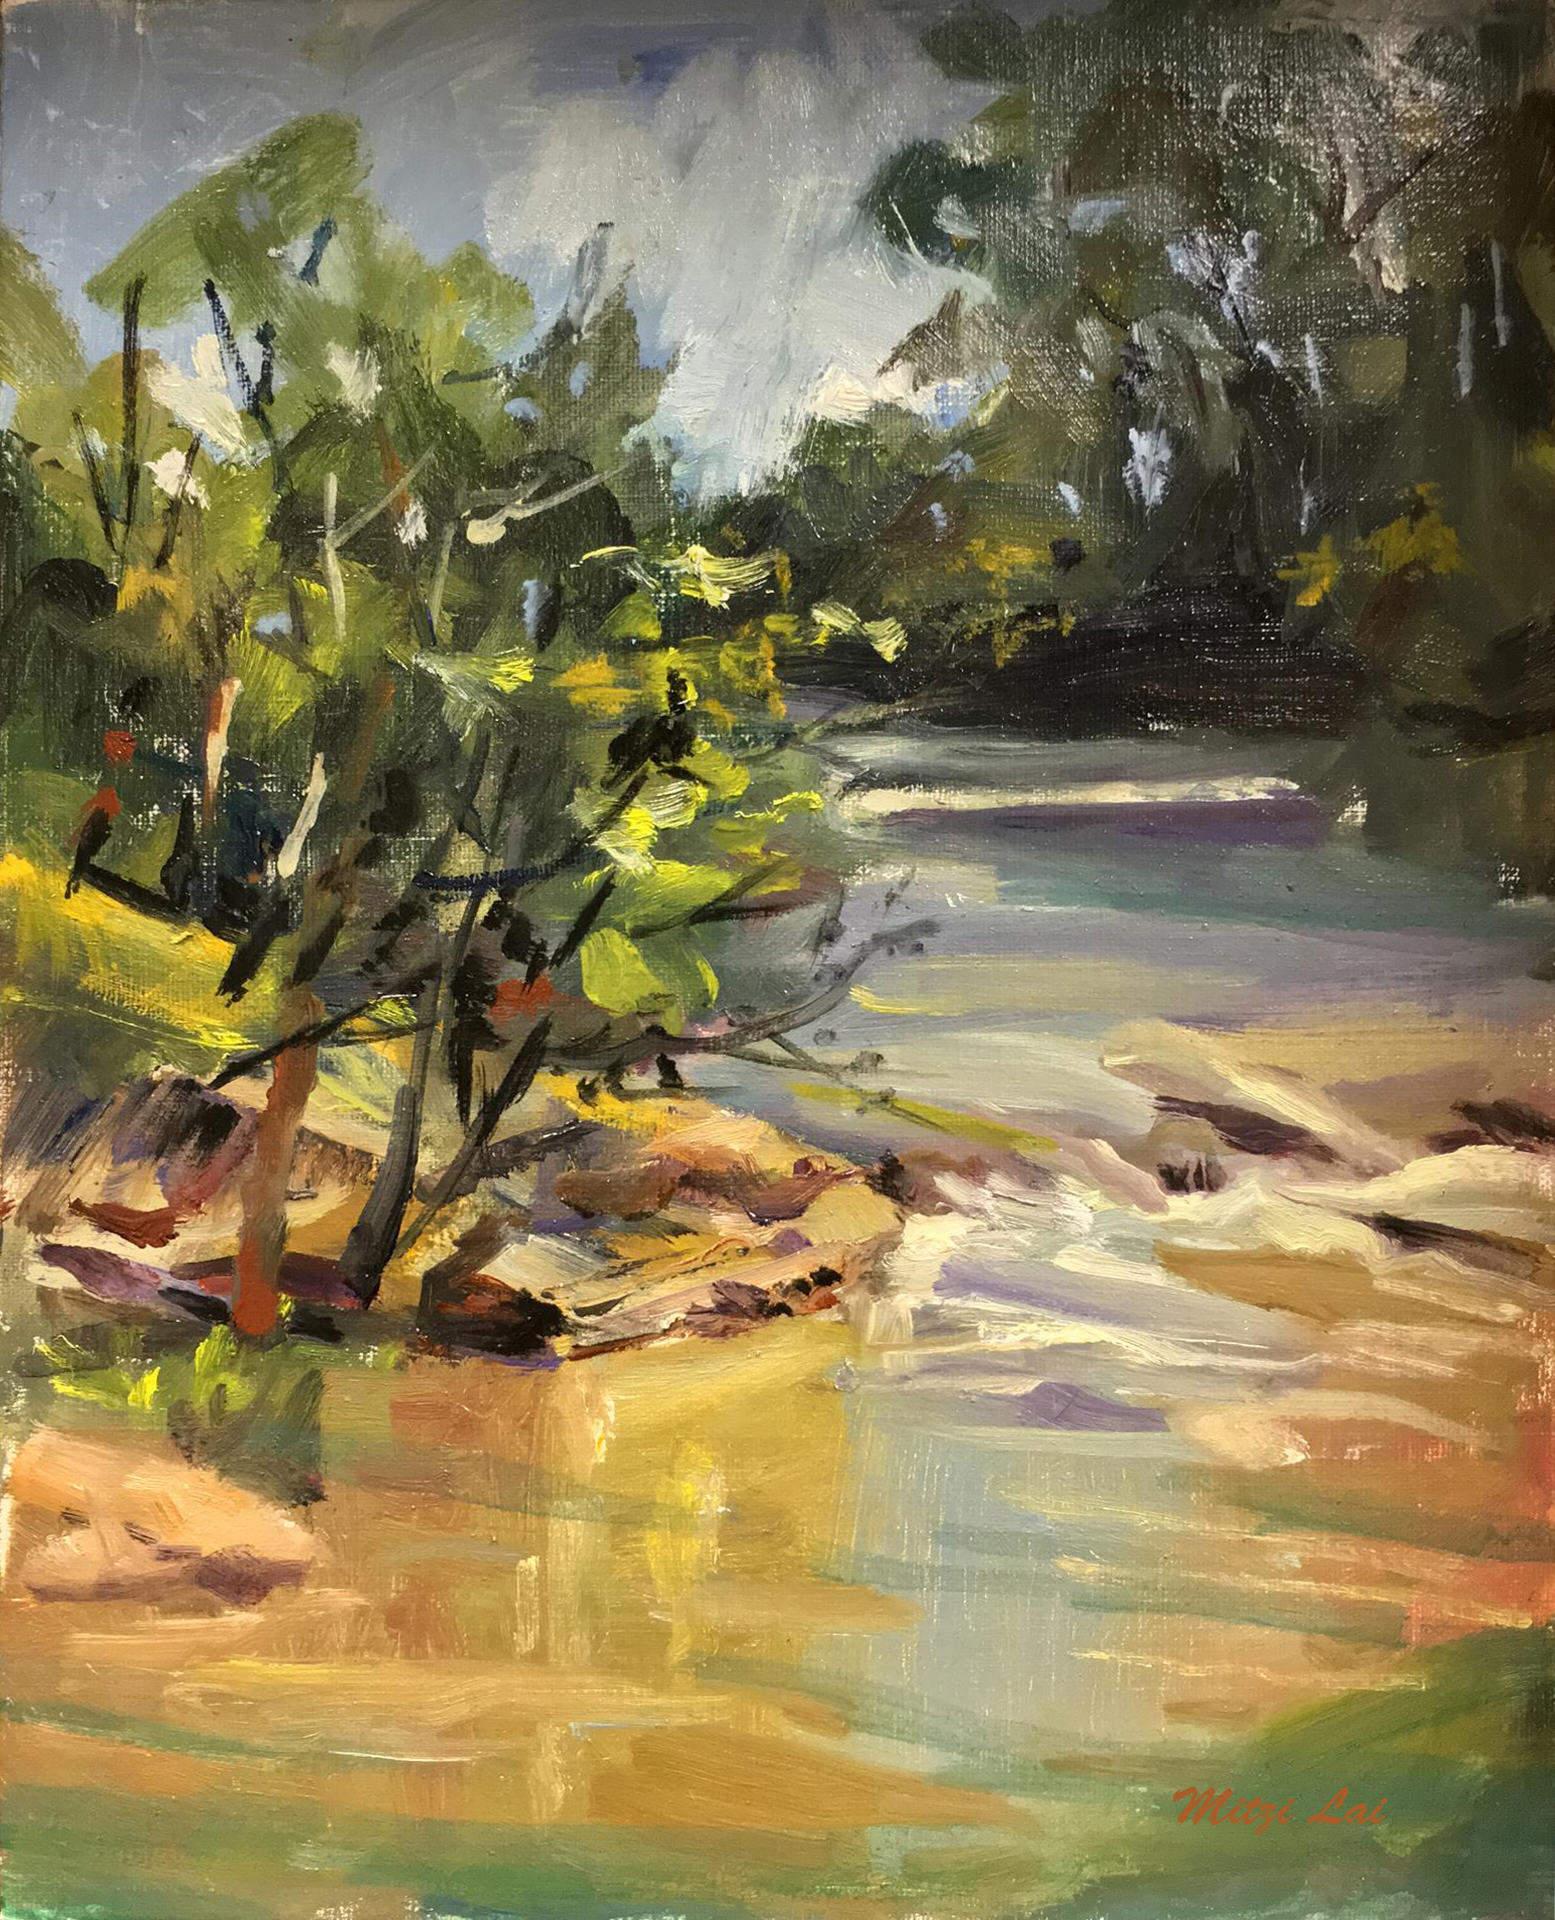 Mitzi Lai | CUYAHOGA RIVER | oil | frame size 14x16